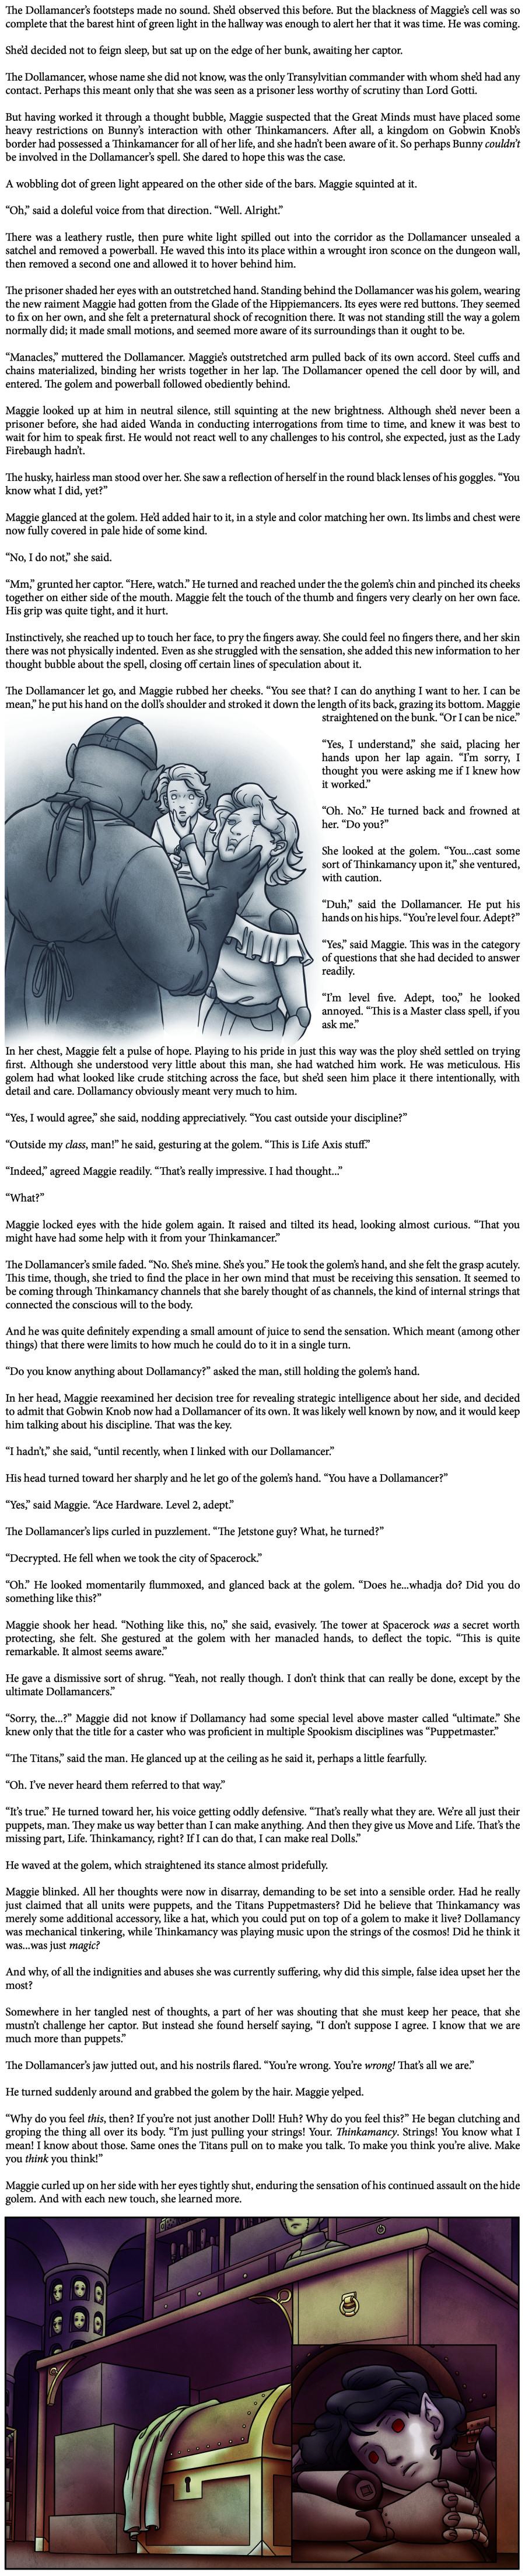 Comic - Book 4 - Page 9 - Prologue 9